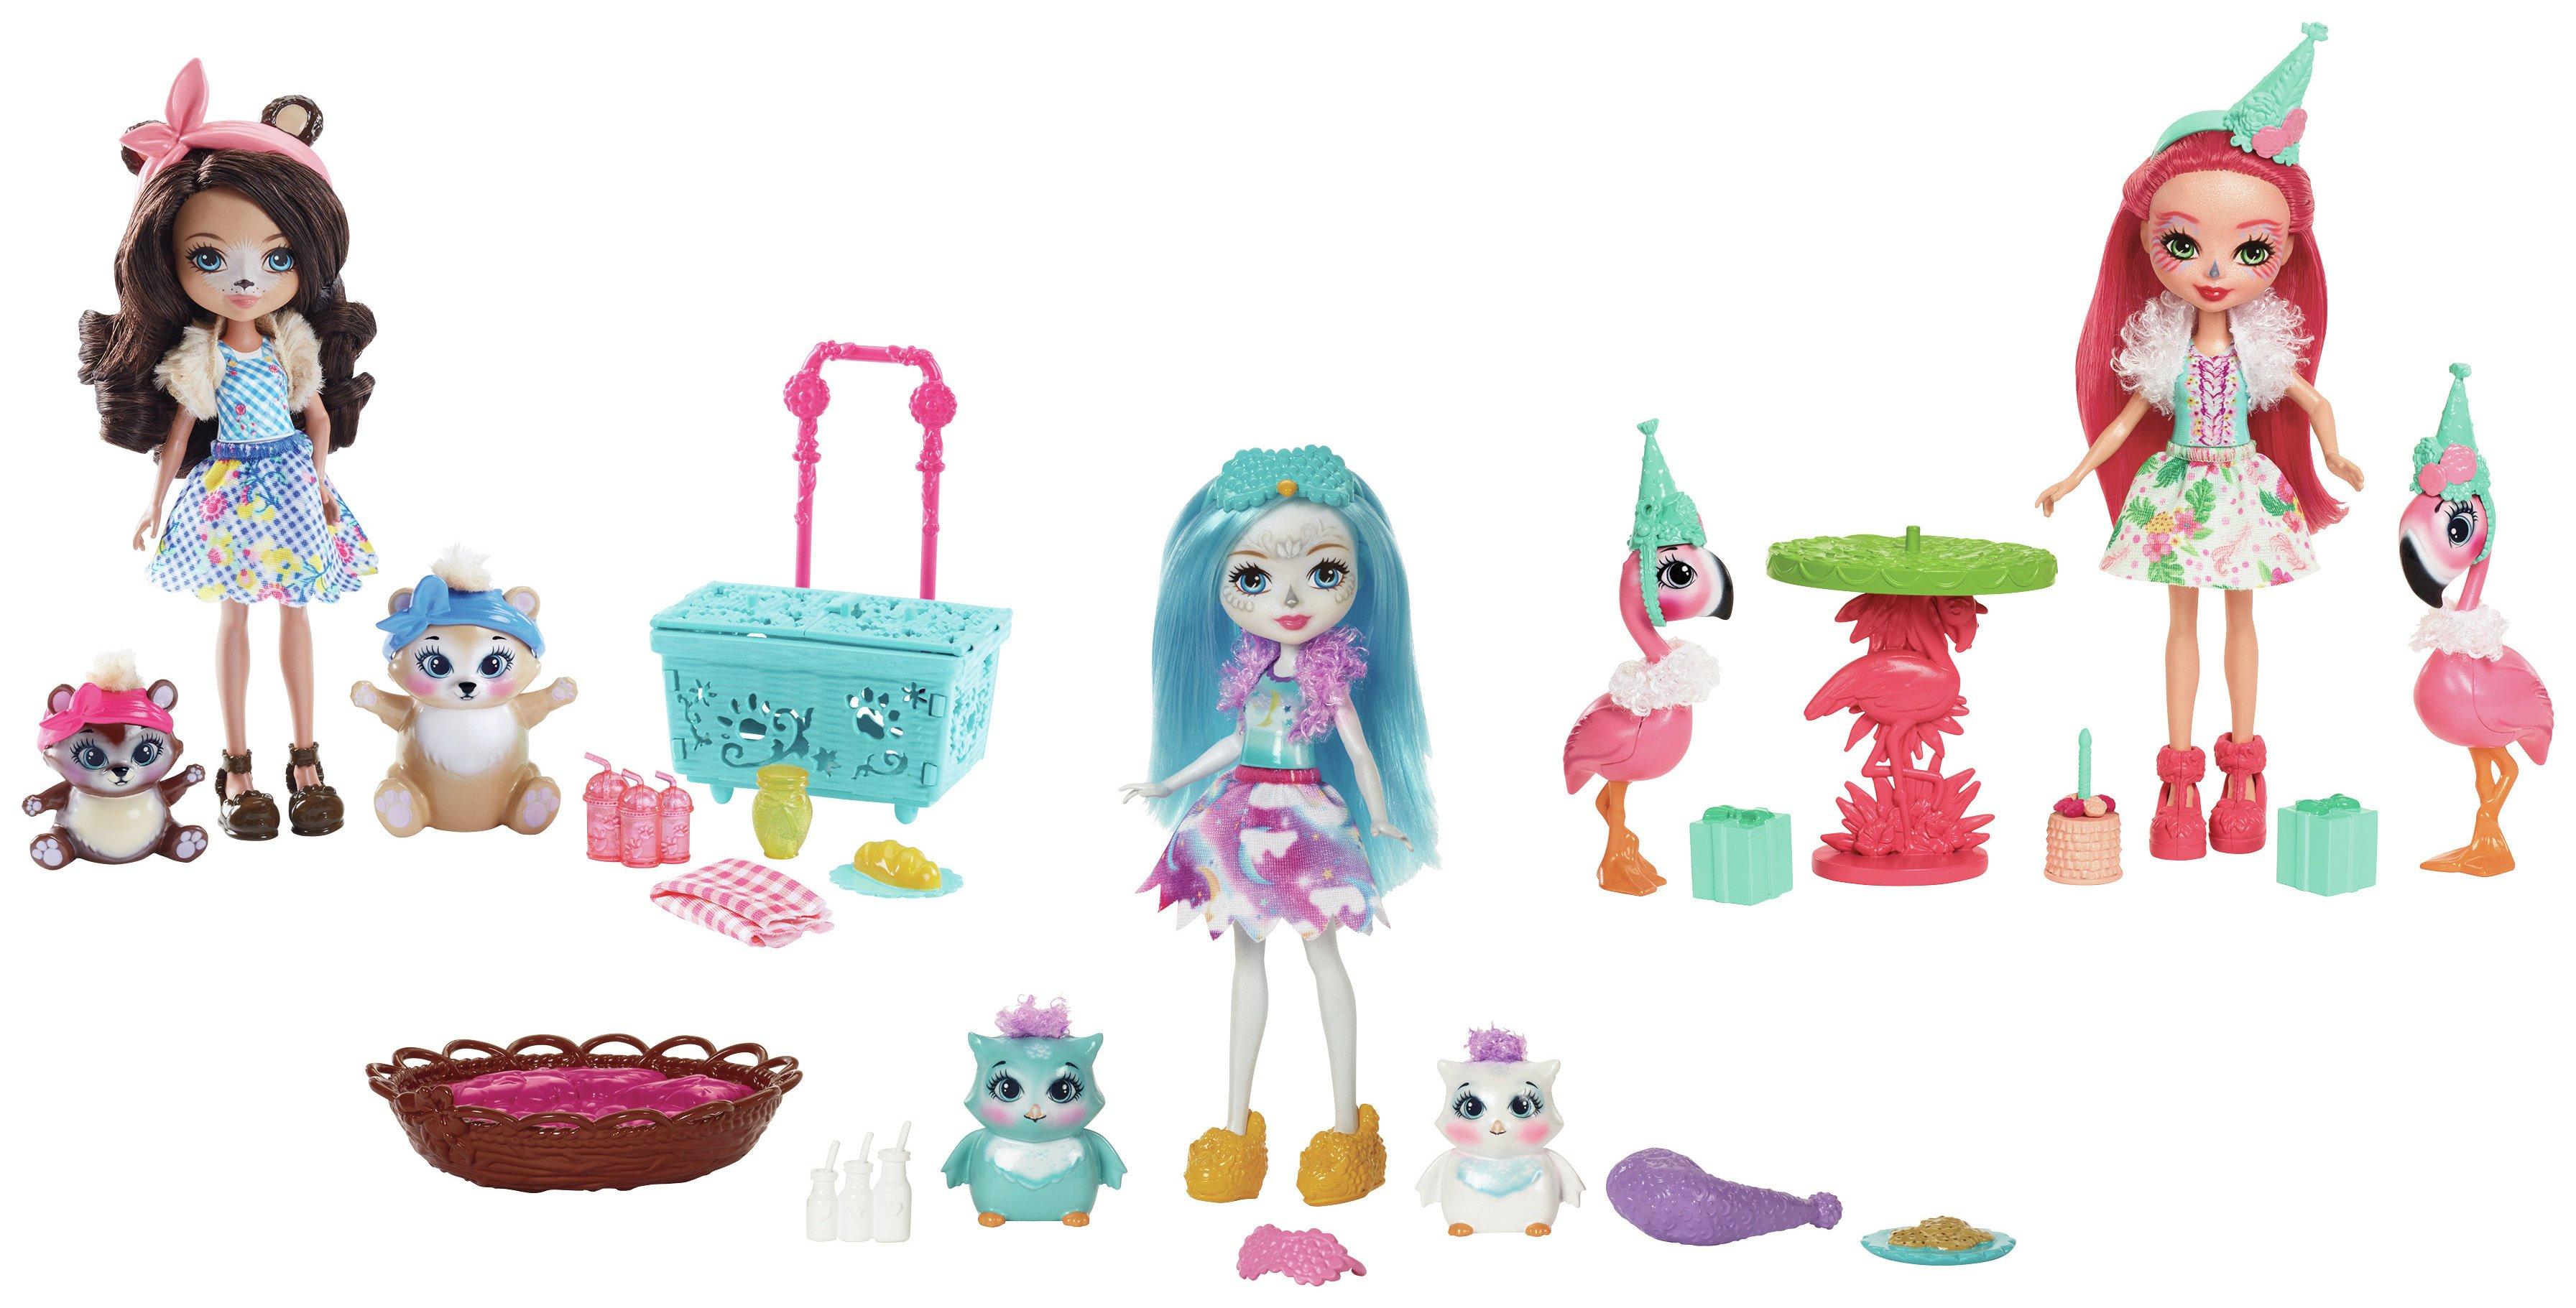 Enchantimals Doll Theme Sets Assortment